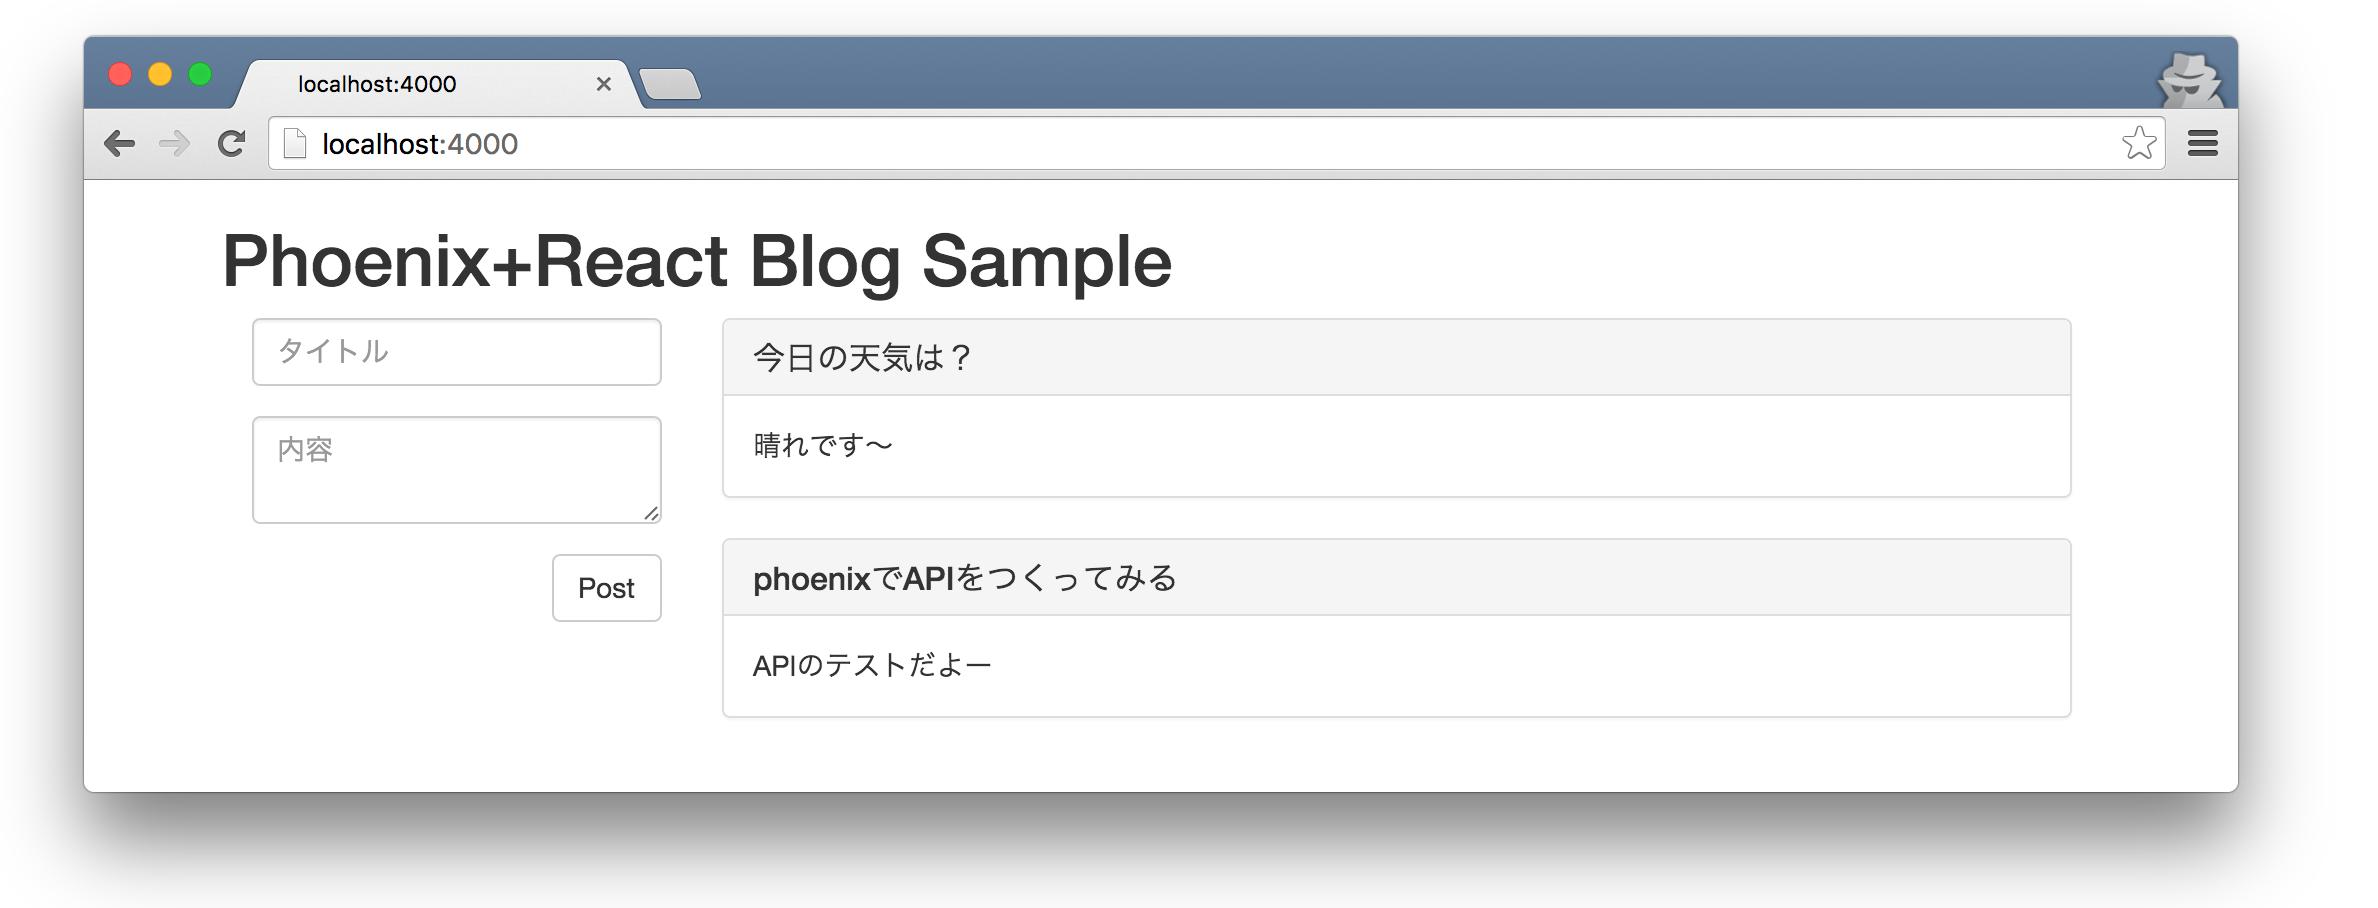 blog_sample.png